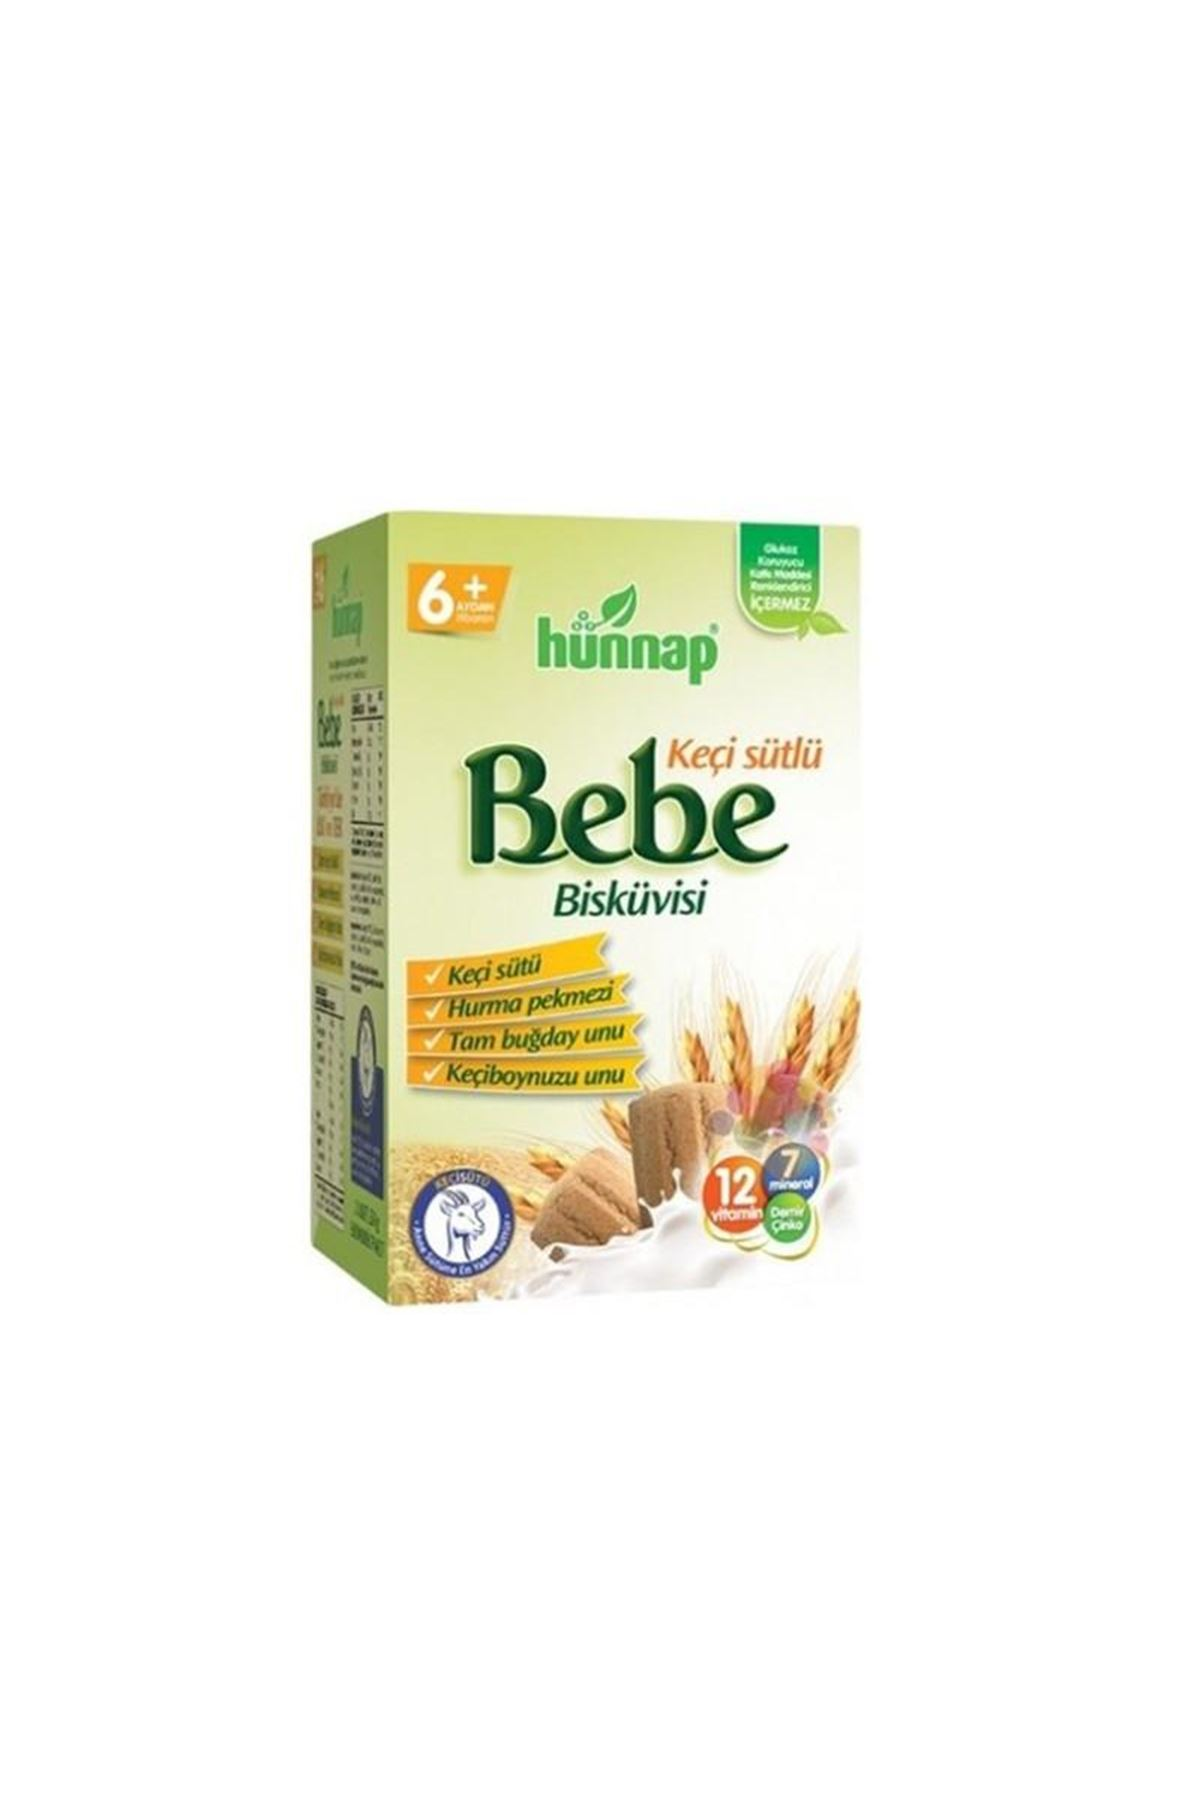 Hünnap Keçisütlü Vitaminli Bebe Bisküvisi 400 Gr